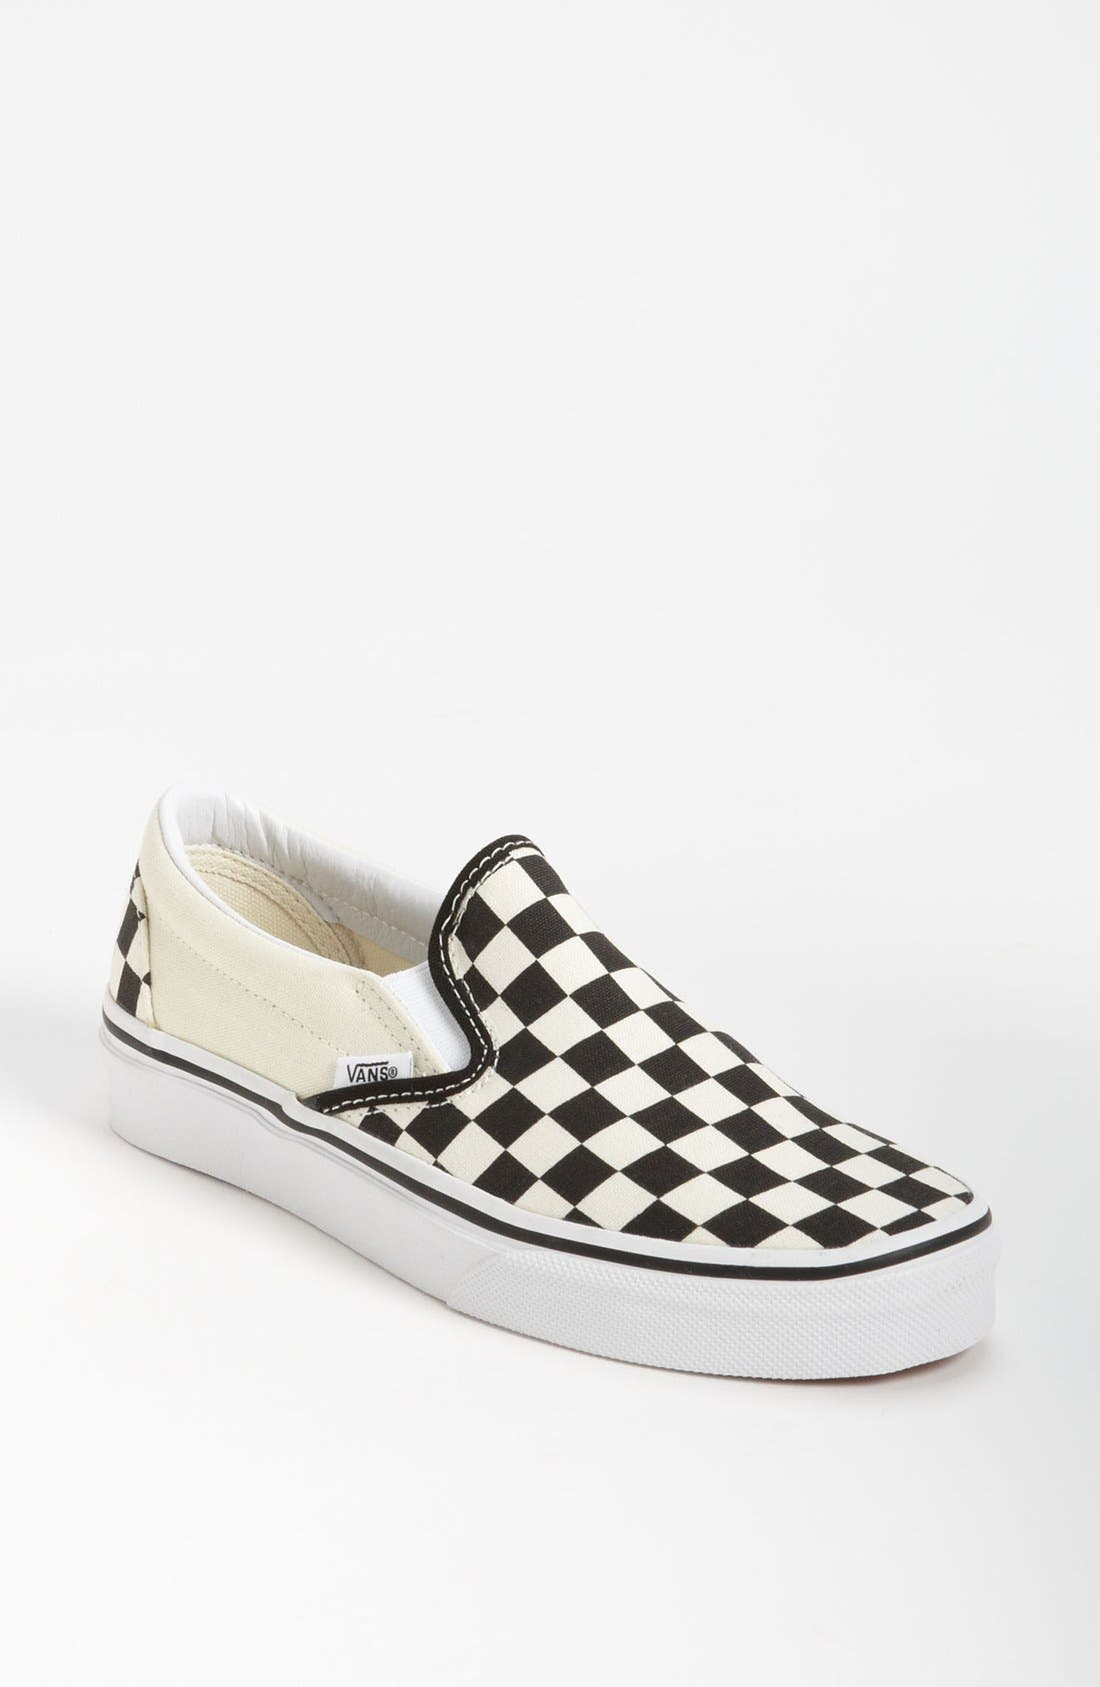 Main Image - Vans 'Classic' Checkerboard Sneaker (Women)